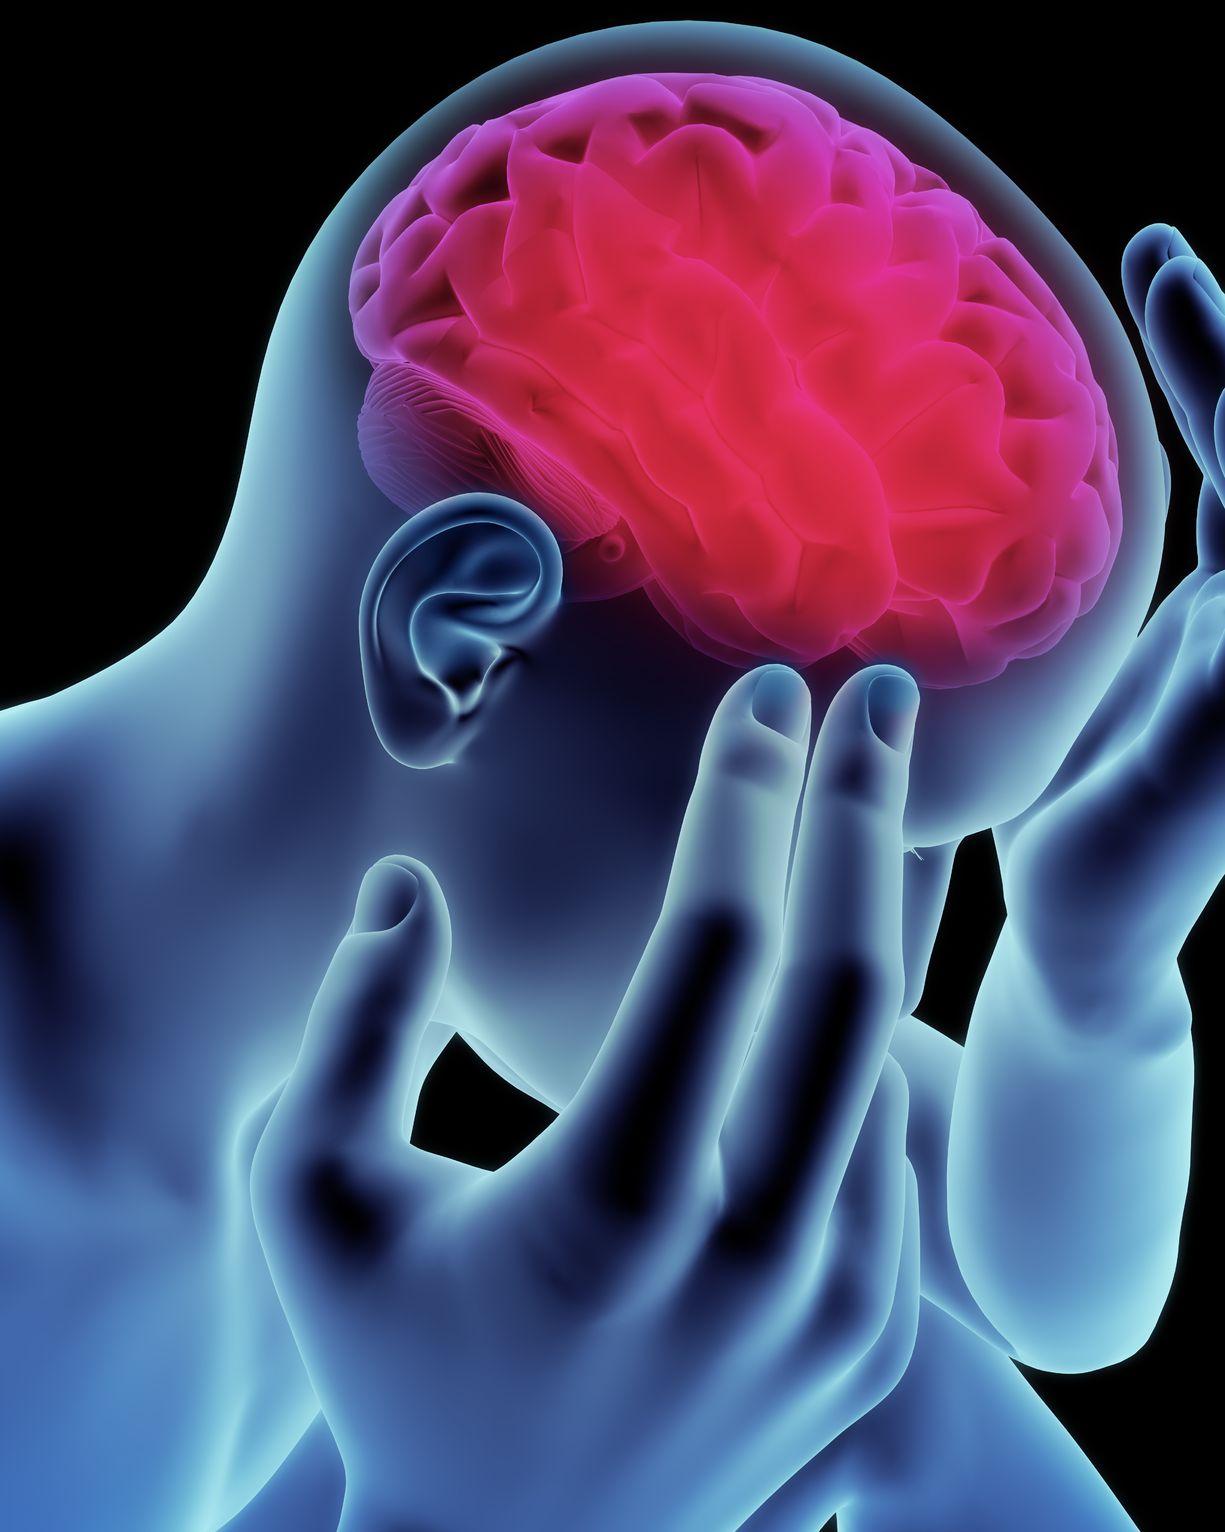 Natural Remedies - Migraines